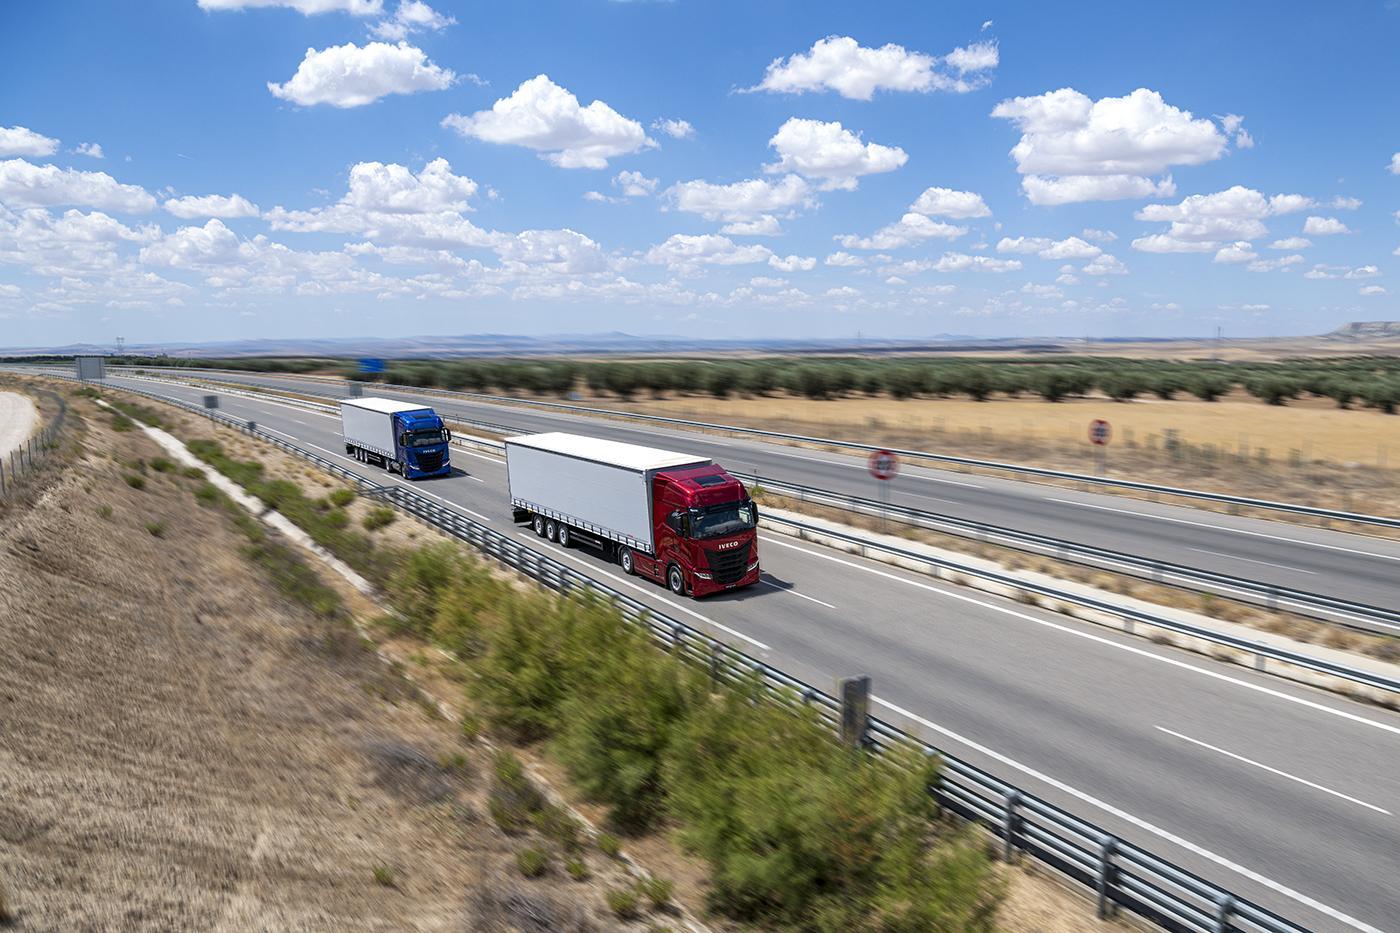 Caravana IVECO S-Way Tour 2020 a debutat la 1 martie